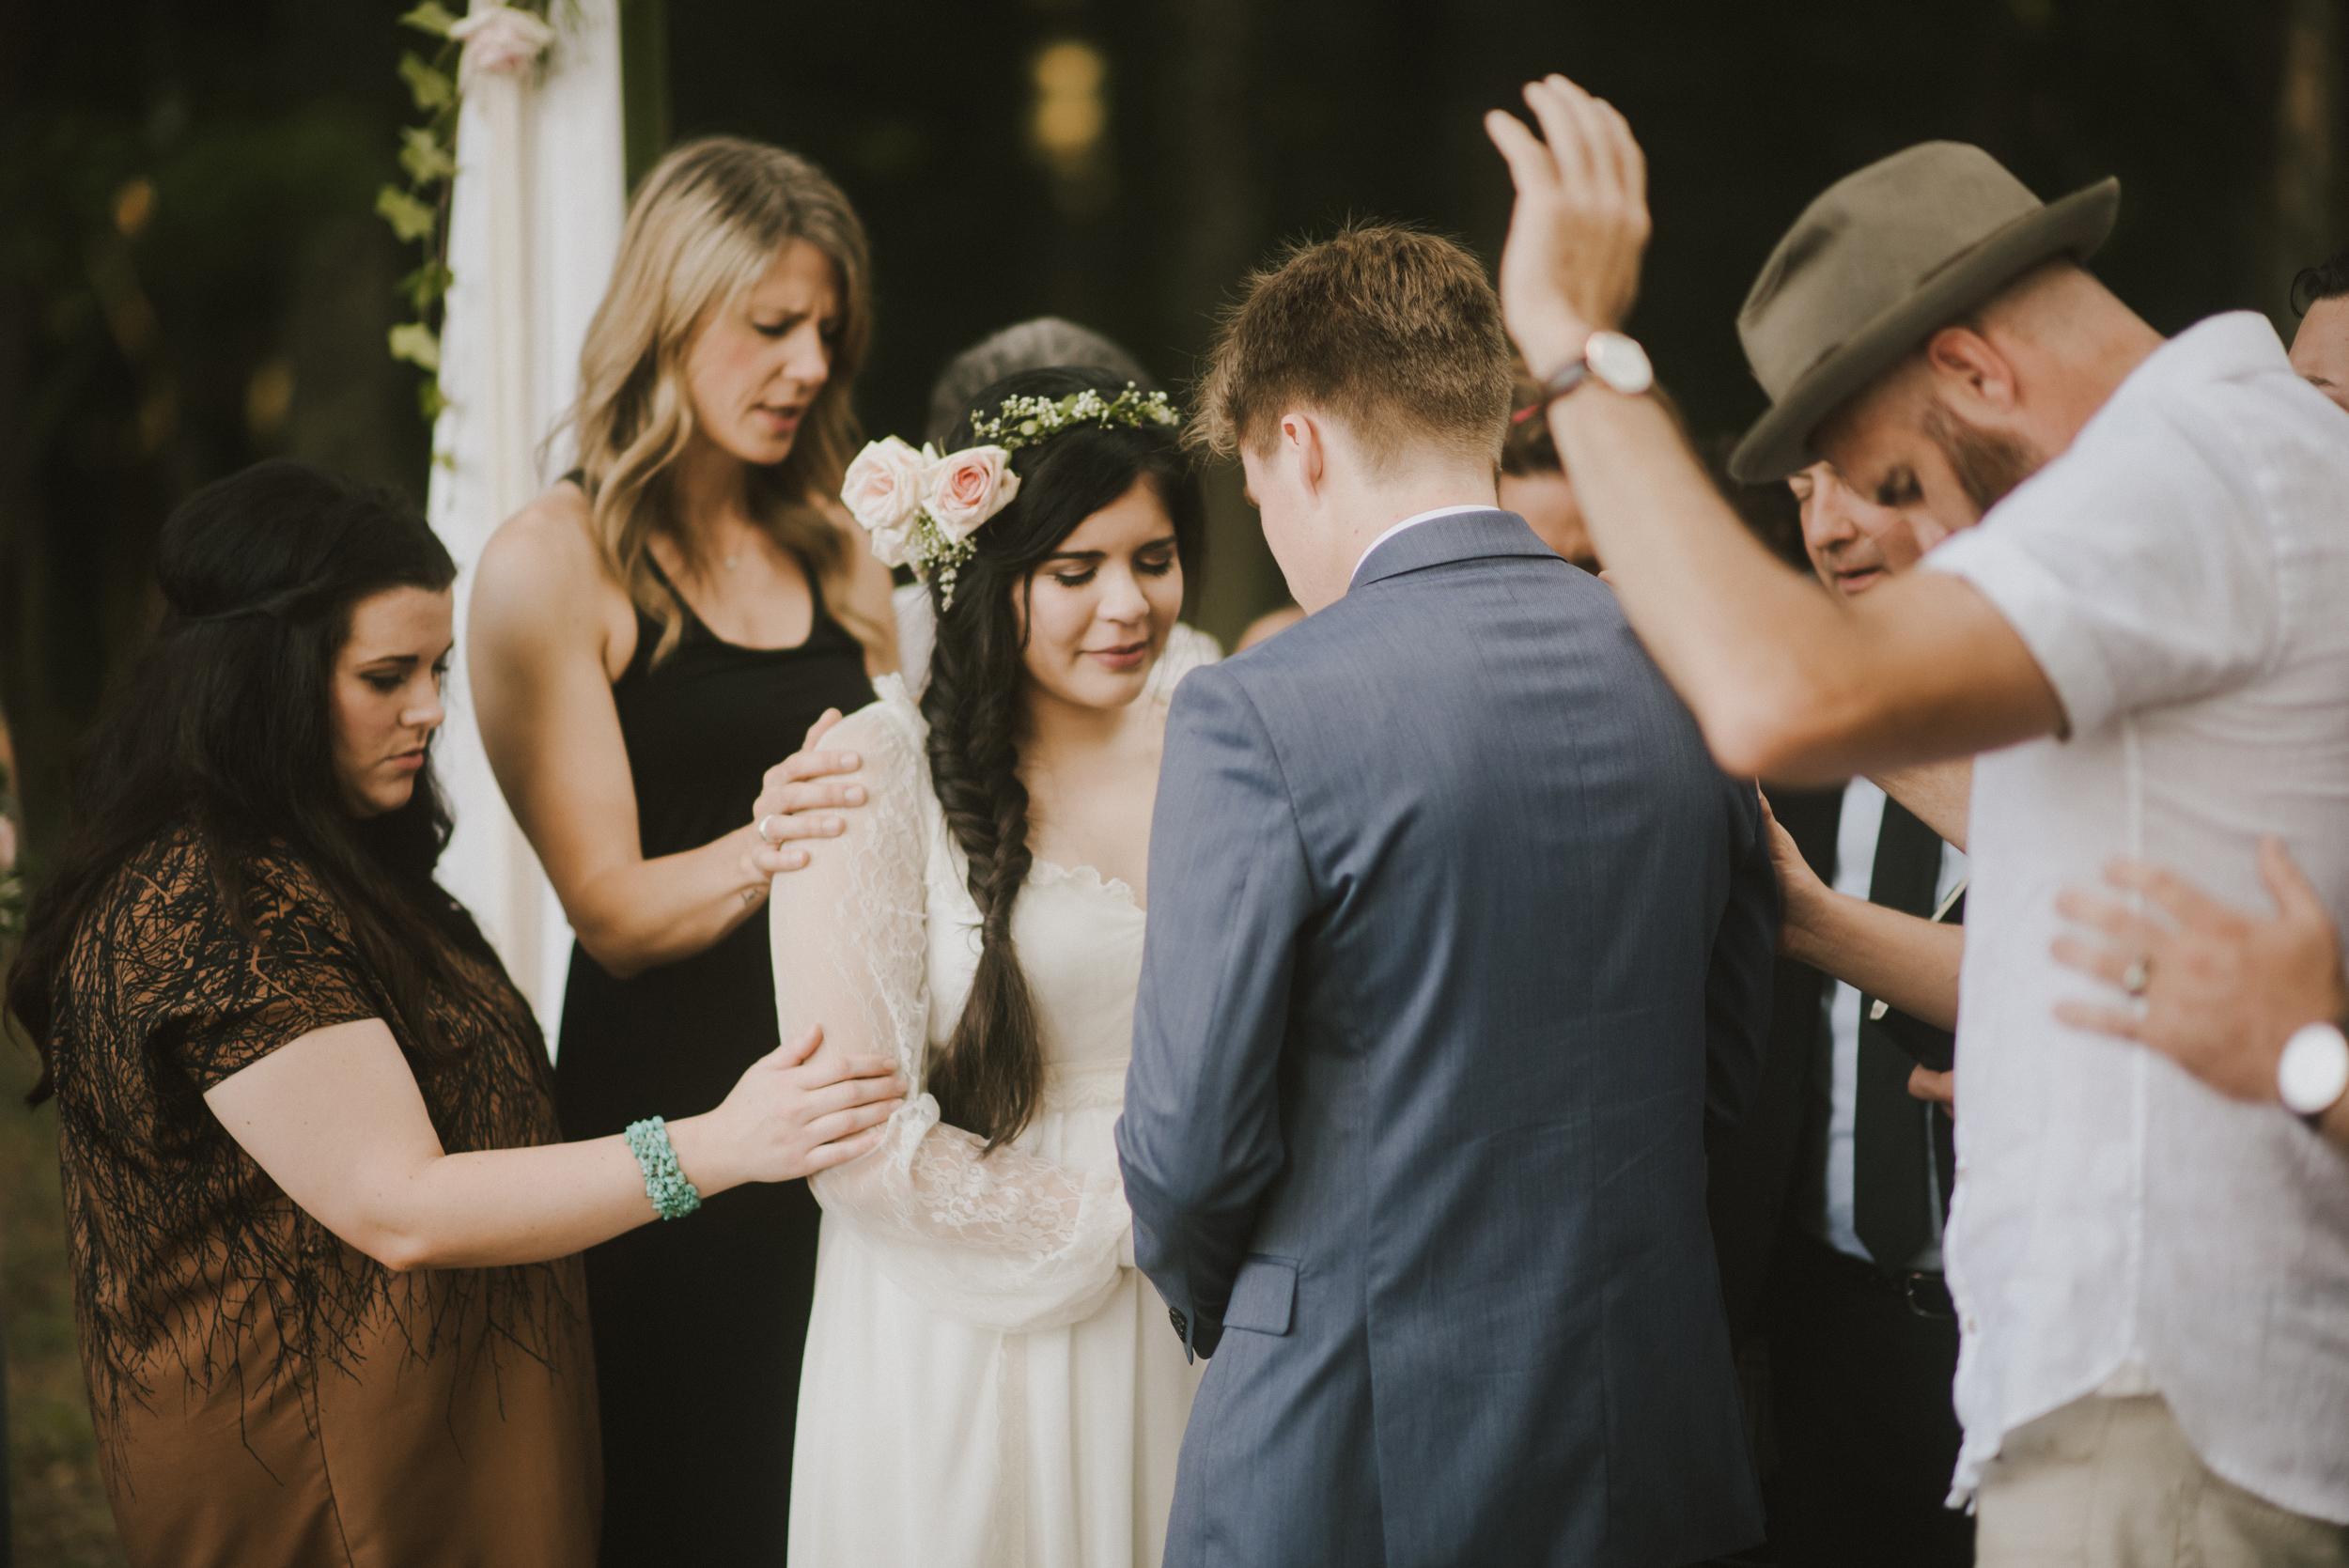 ofRen_weddingphotographer-138.jpg